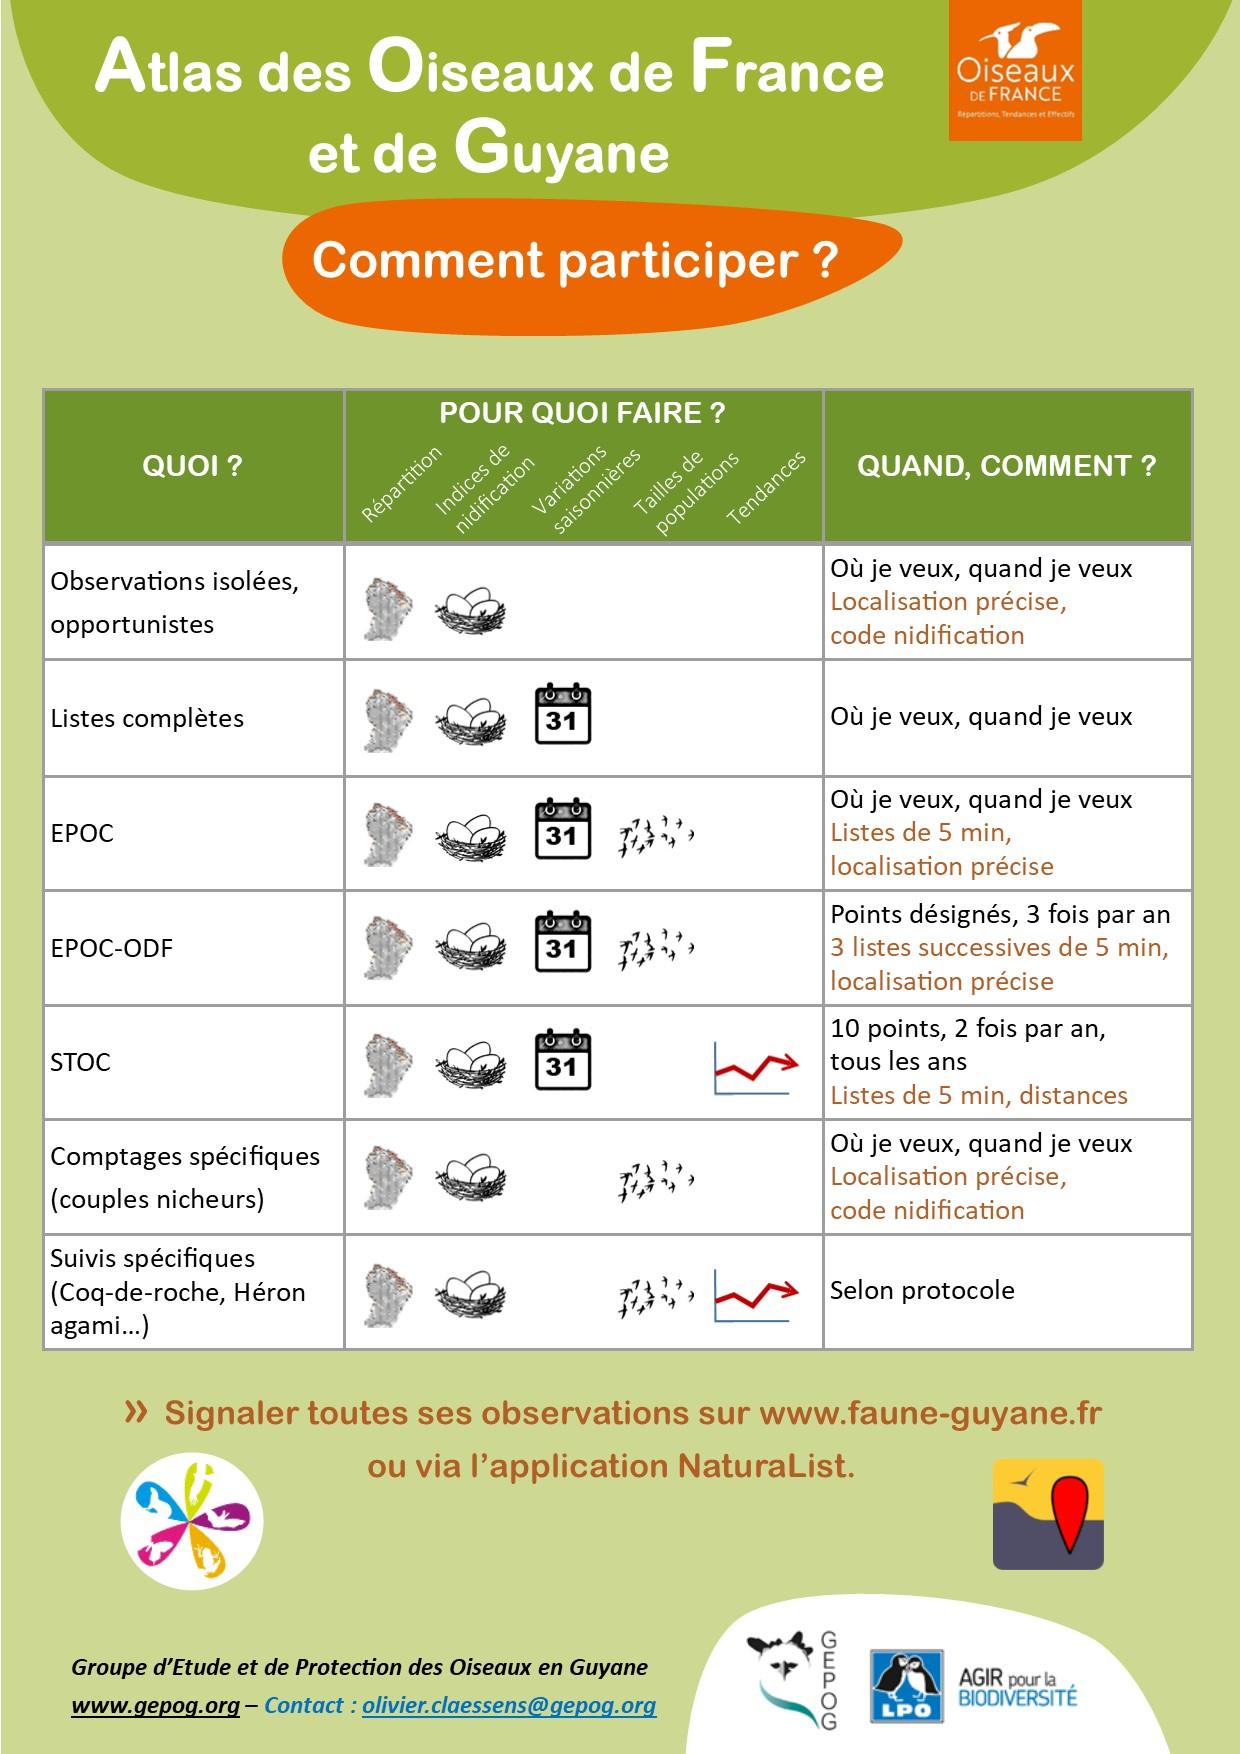 https://cdnfiles1.biolovision.net/www.faune-guyane.fr/userfiles/Documentsdivers/Oiseaux/AFFICHEODFCOMMENTPARTICIPER.jpg